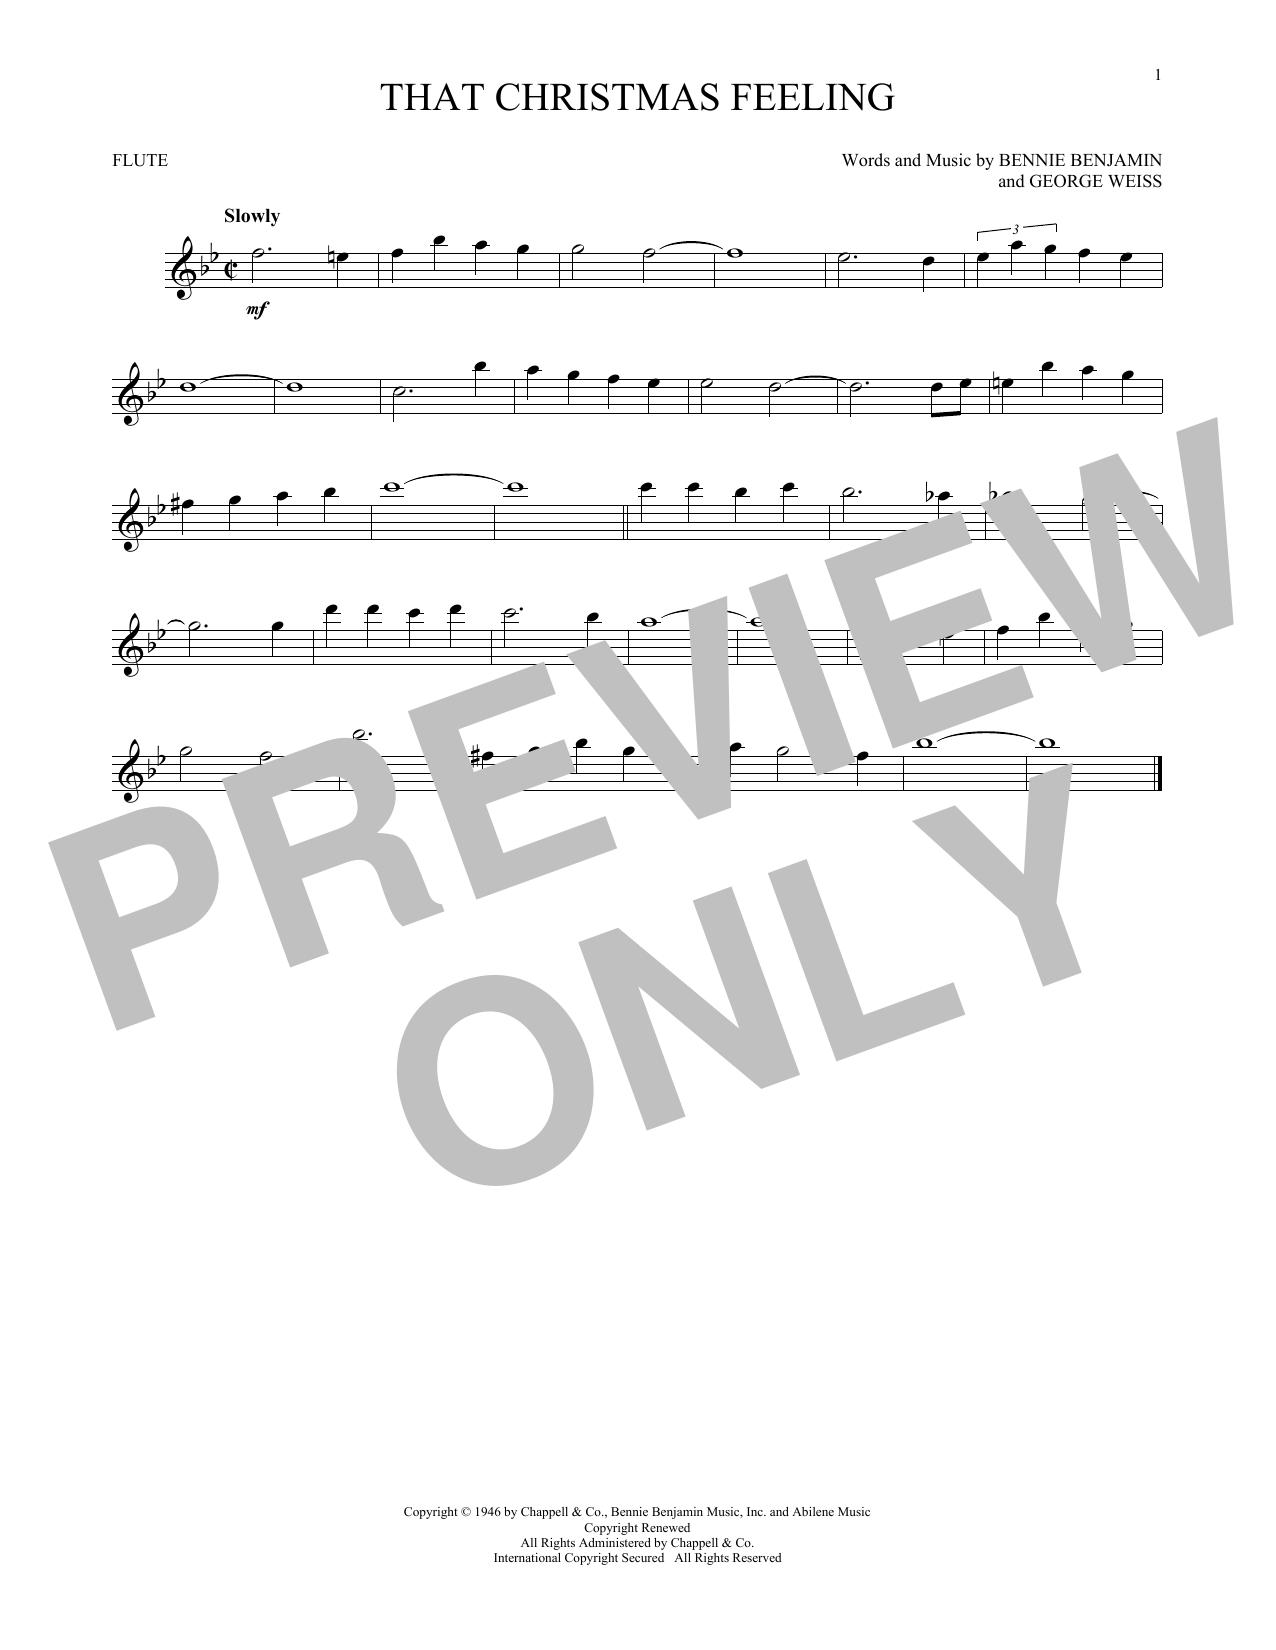 Partition flûte That Christmas Feeling de Bennie Benjamin & George Weiss - Flute traversiere